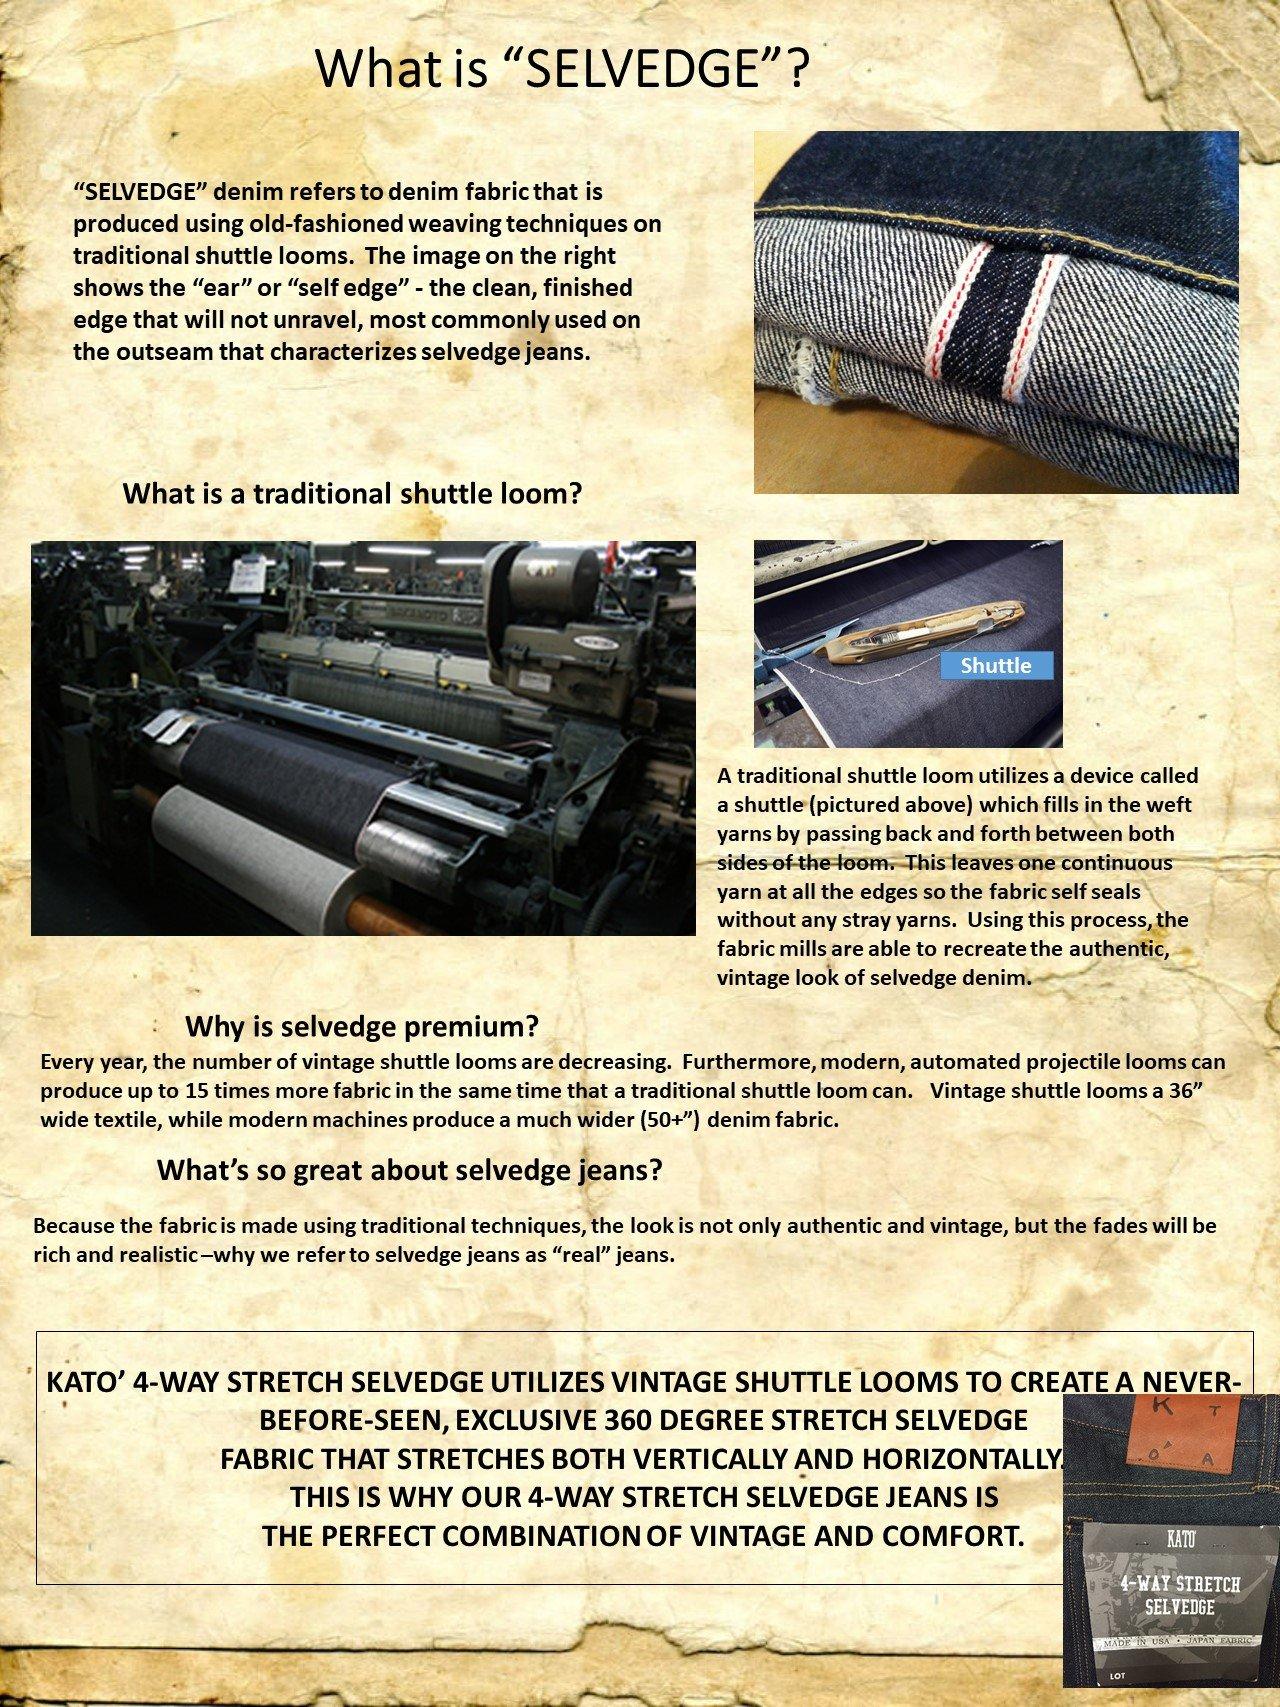 HIROSHI KATO Jeans Men's The Needle Skinny Raw Black 10.5 Oz 4-Way Stretch Selvedge Denim Skinny Fits Made In USA Raw Black 36 by HIROSHI KATO (Image #5)